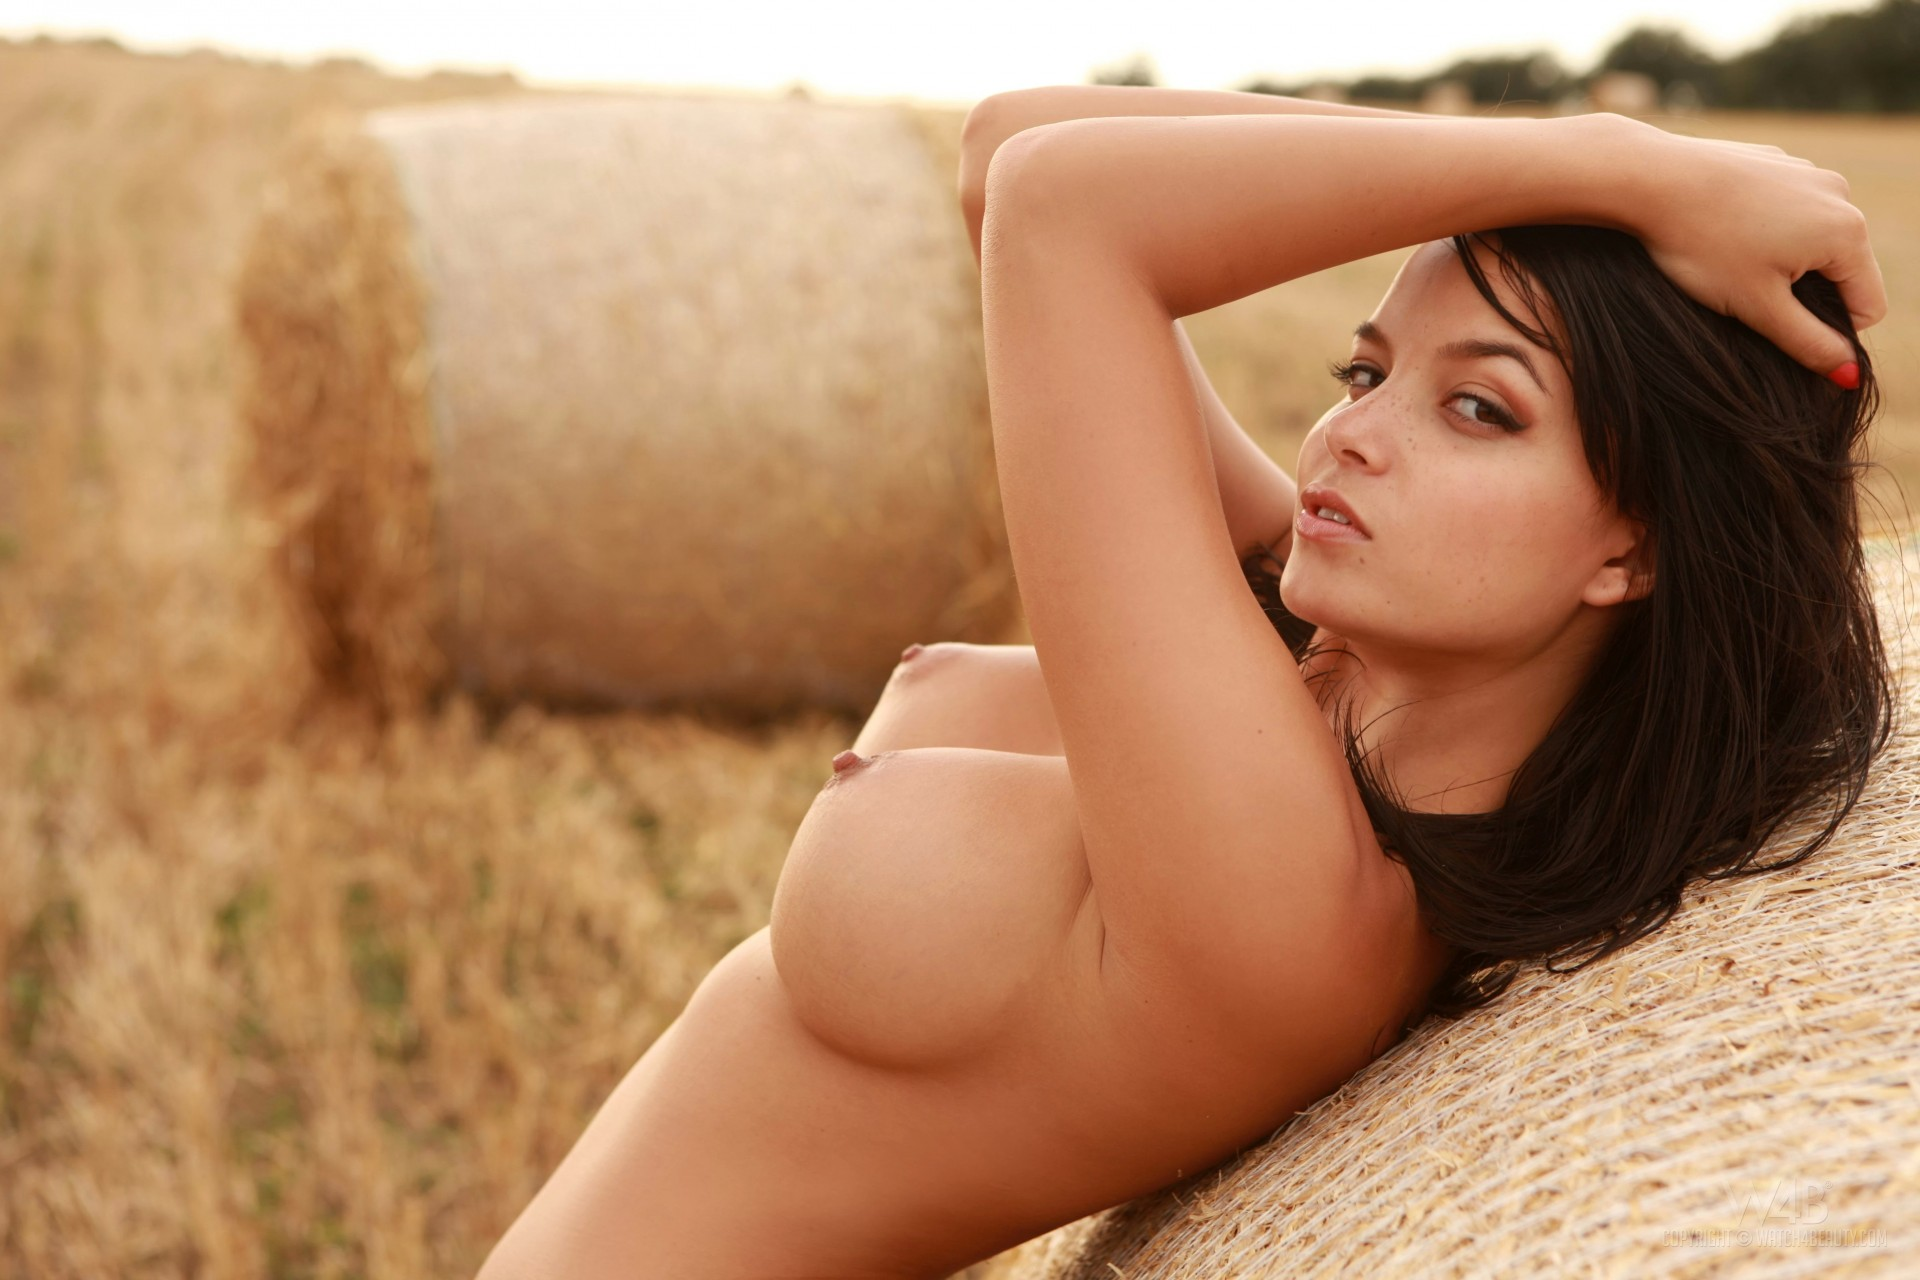 Busting blowjob videos of girls with beautiful boobs girls vigina